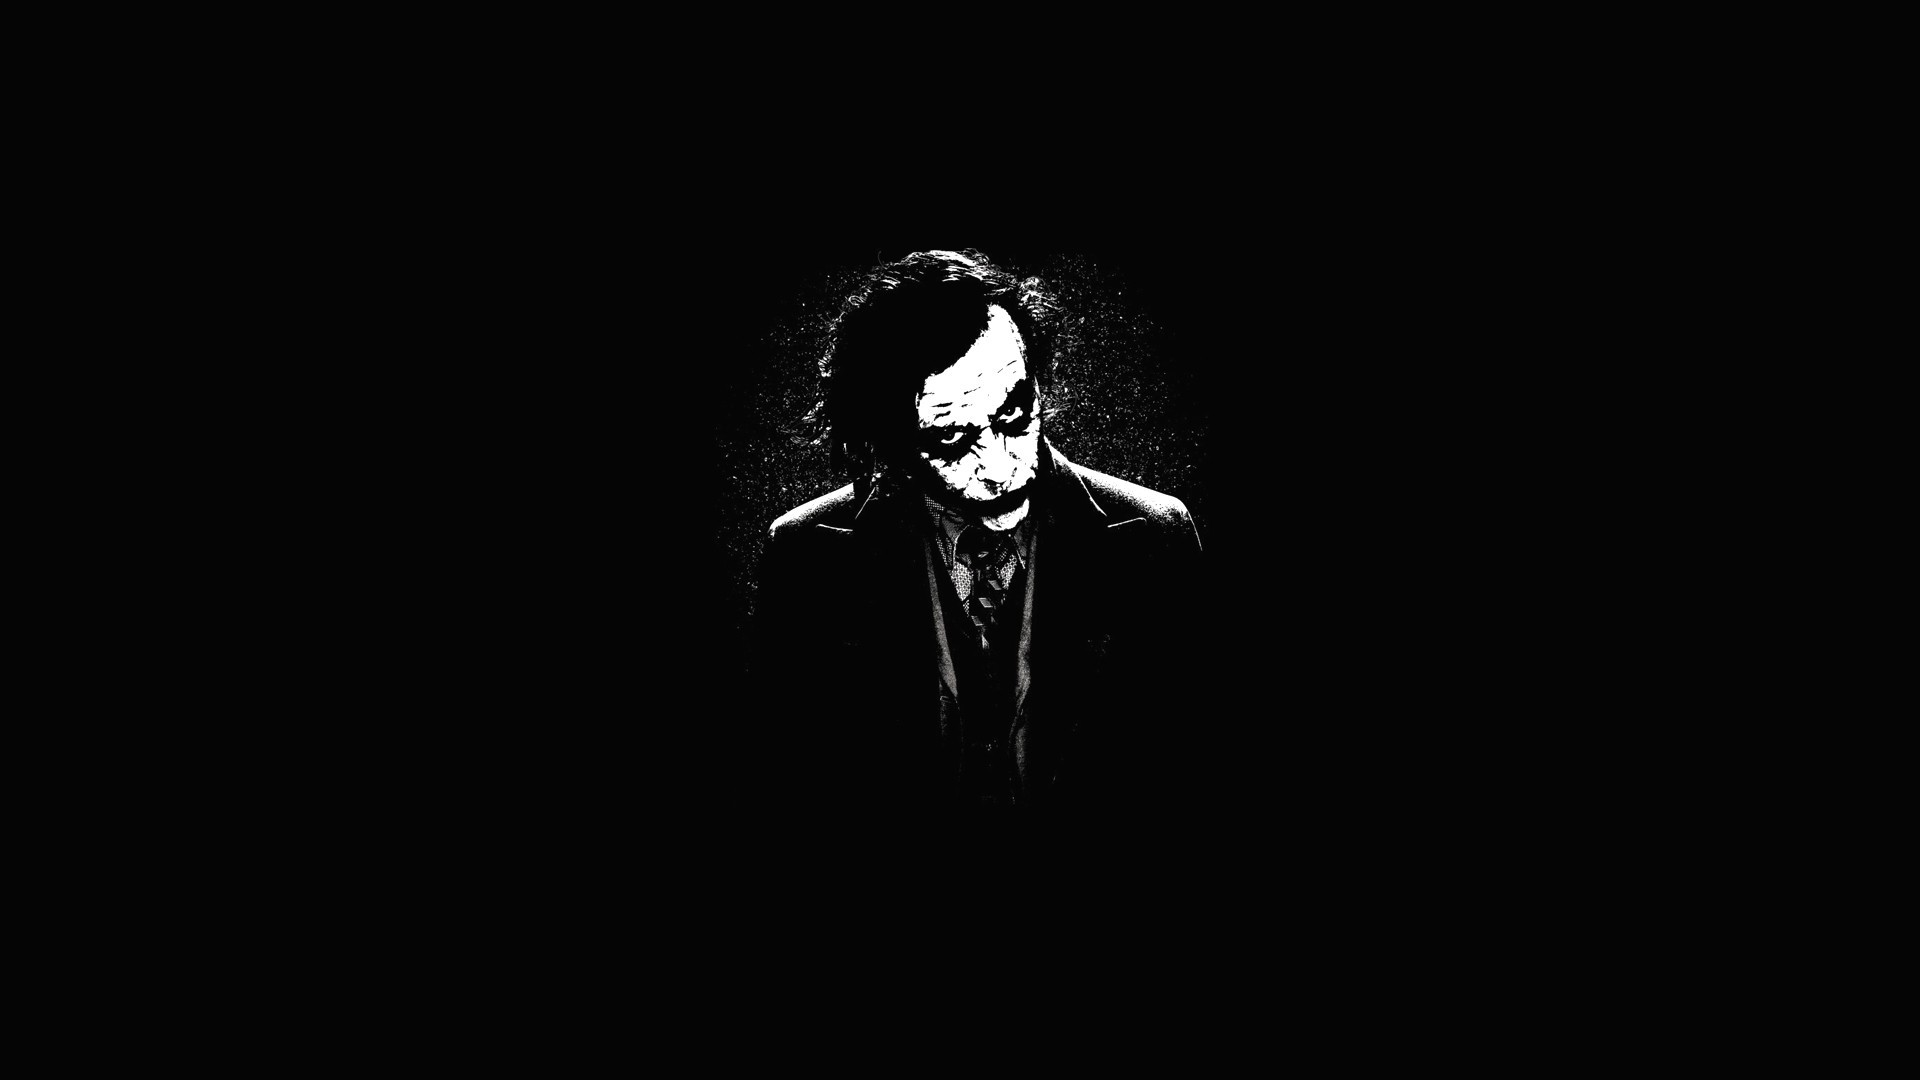 The Joker - The Dark Knight 1920x1080